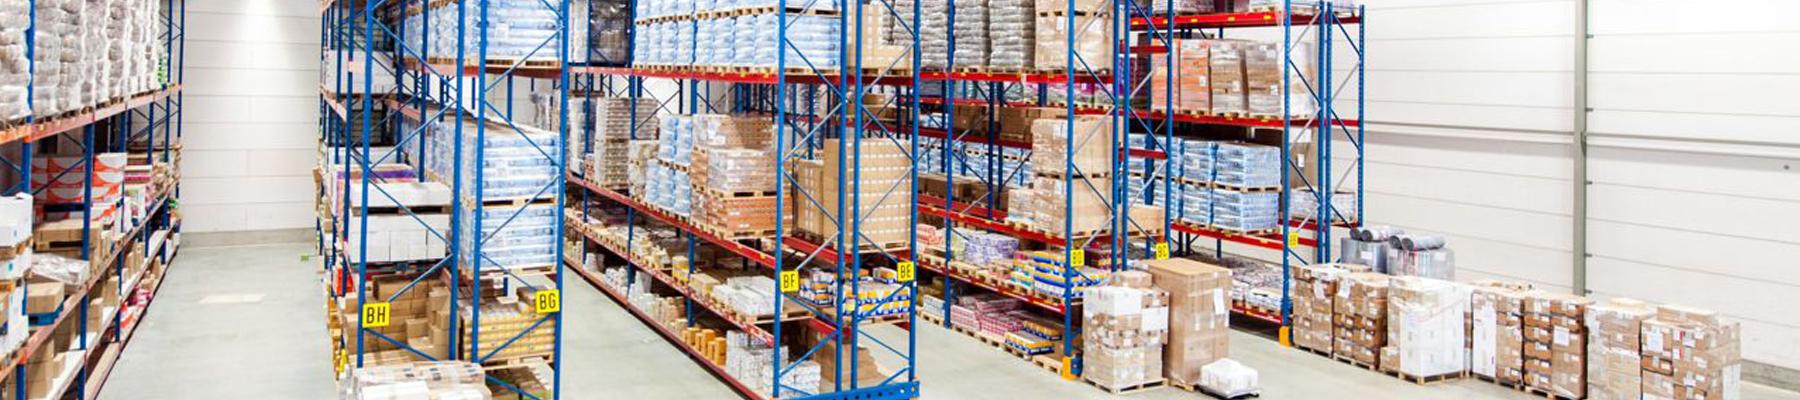 Warehouse magazijn Malanico